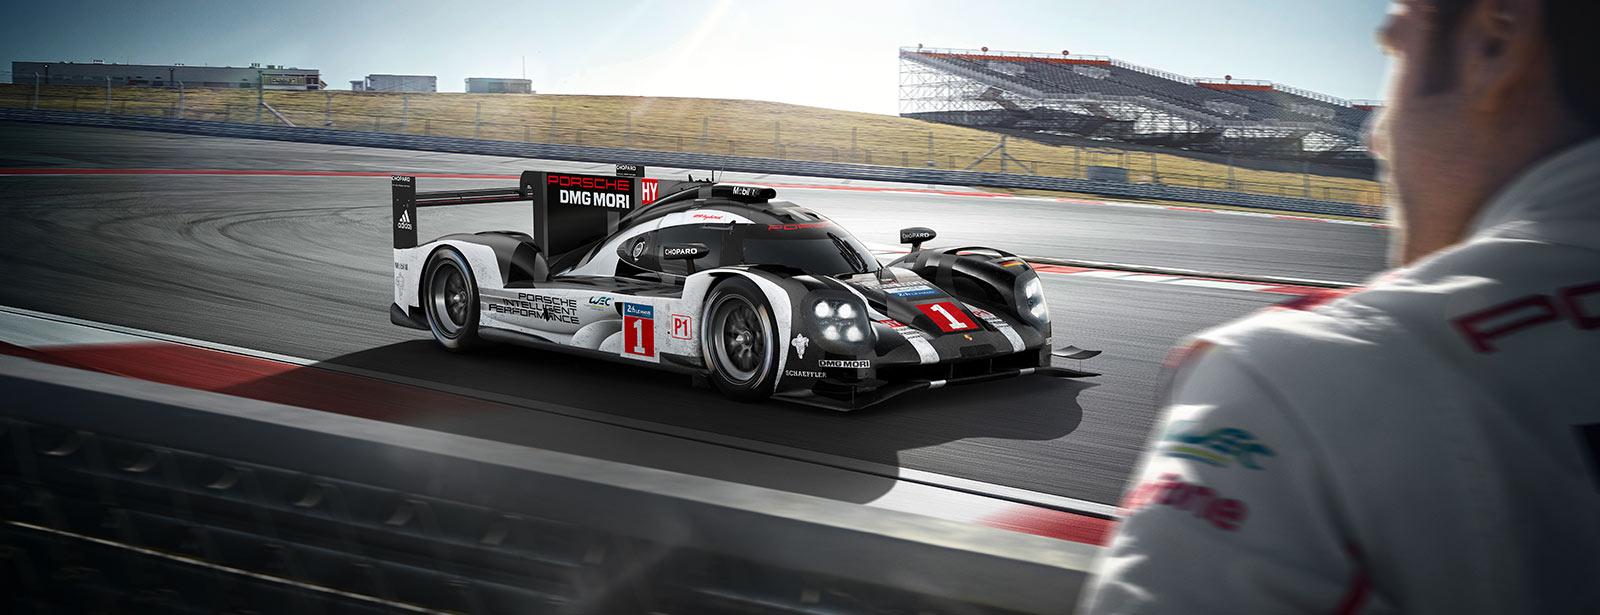 Porsche - 6 Hours of Nürburgring. - FIA World Endurance Championship.